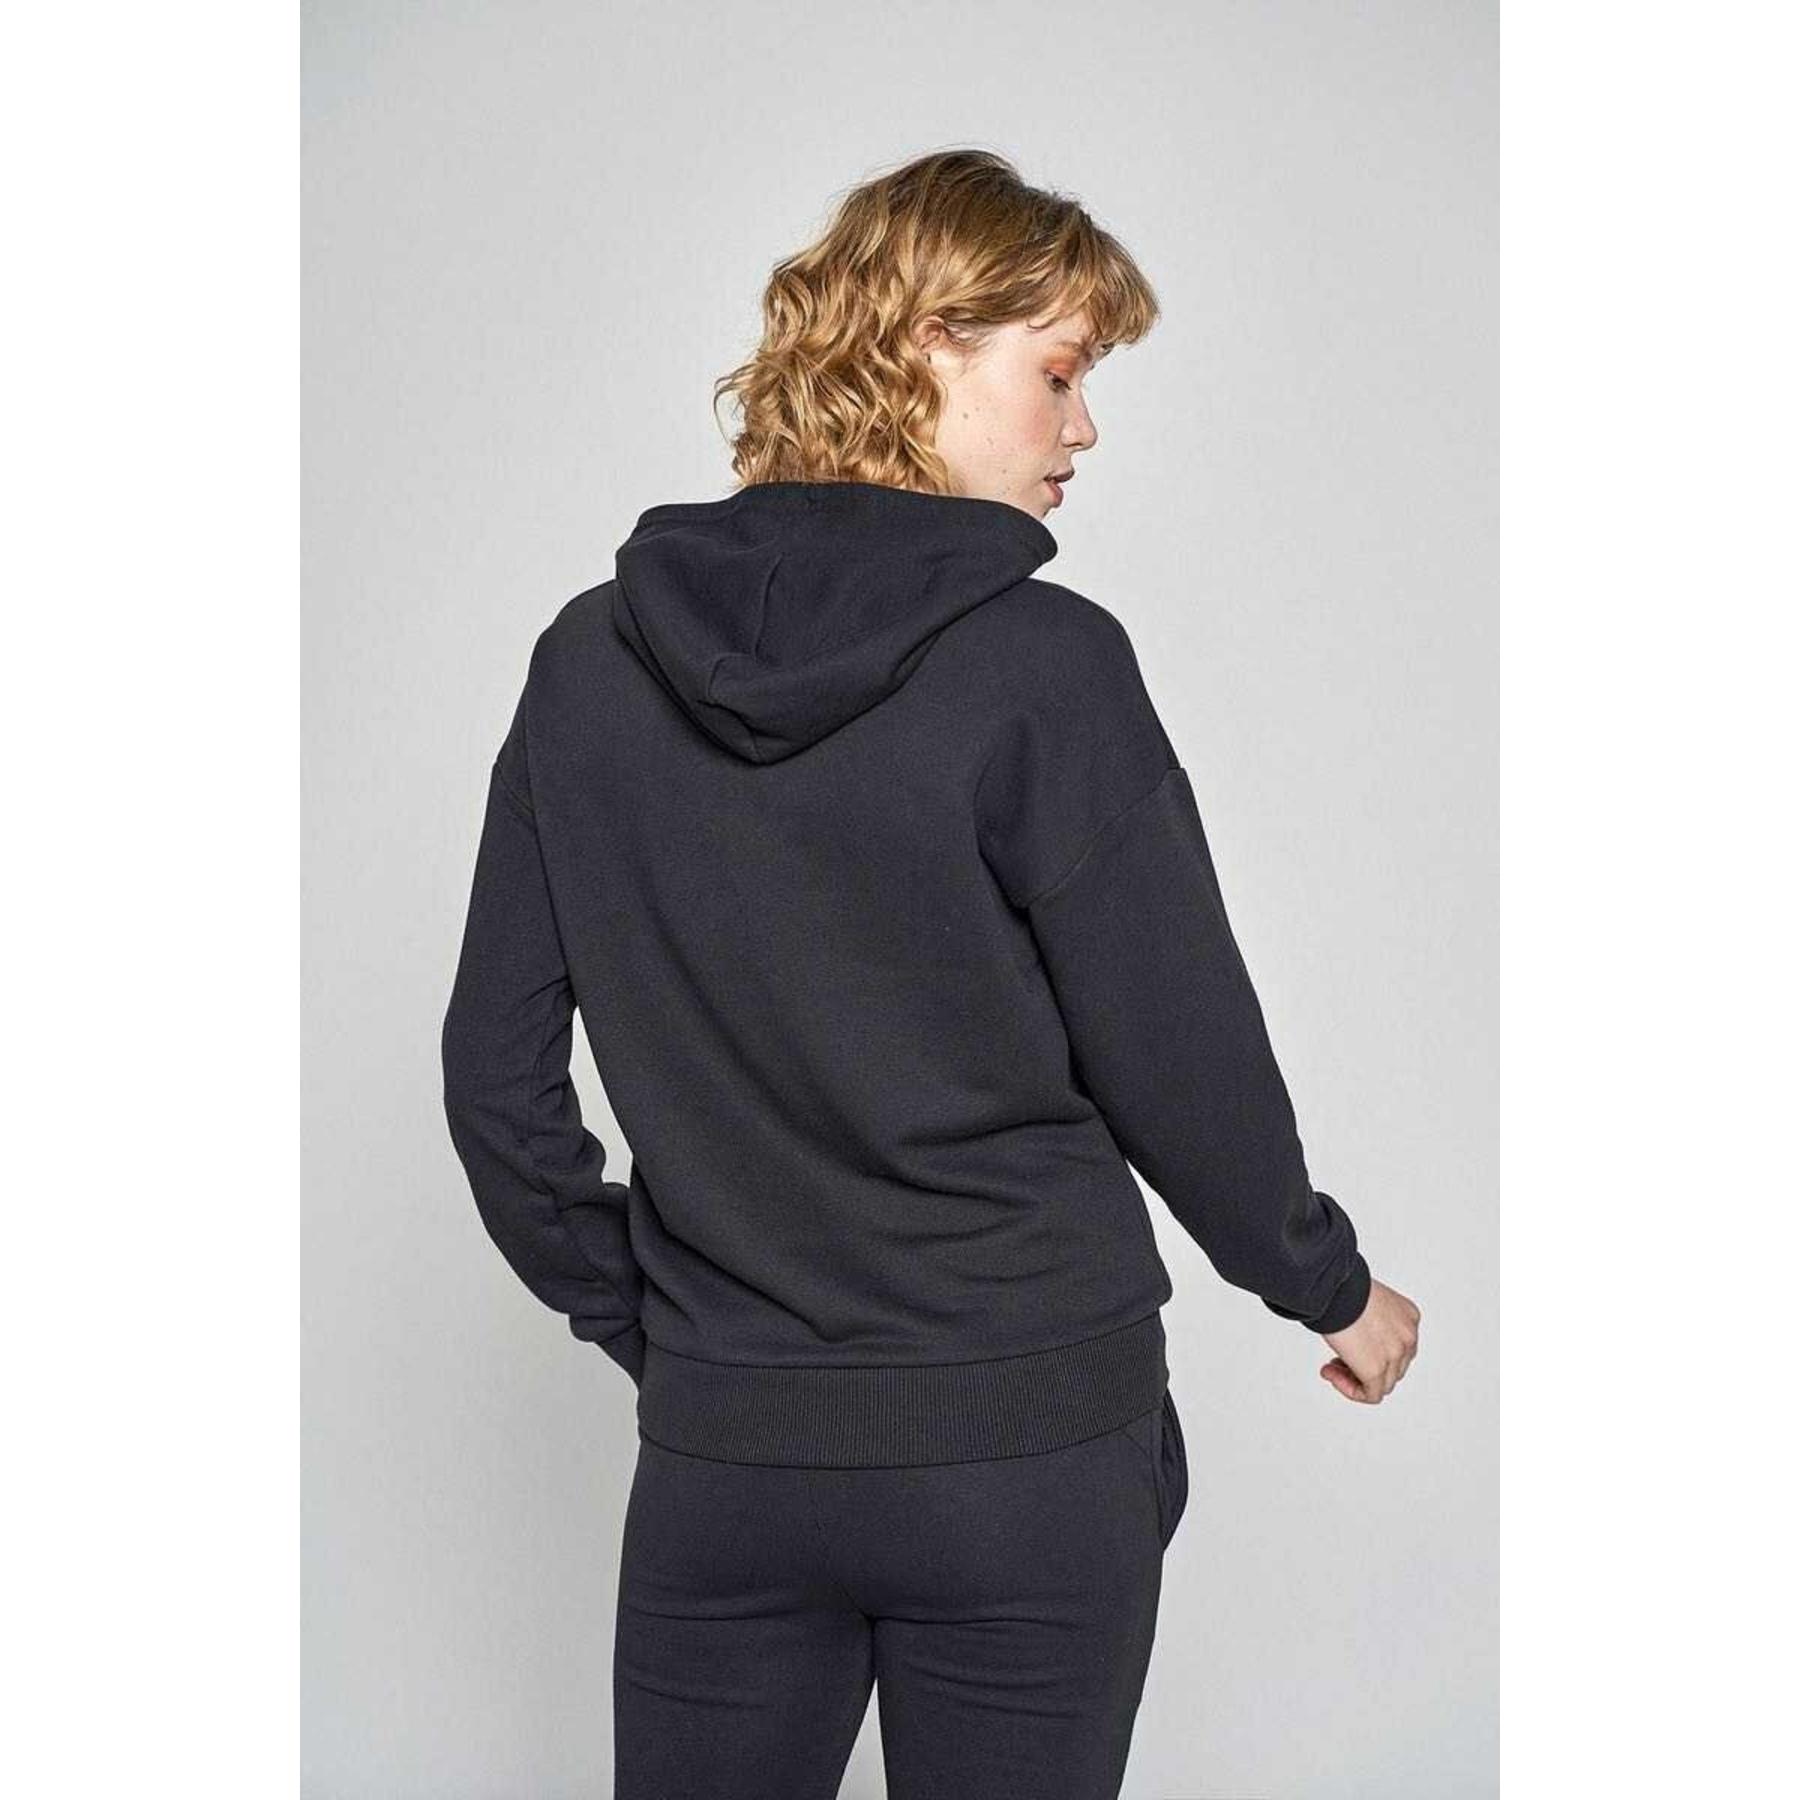 Hummel Dami Kadın Siyah Sweatshirt (920927-2001)